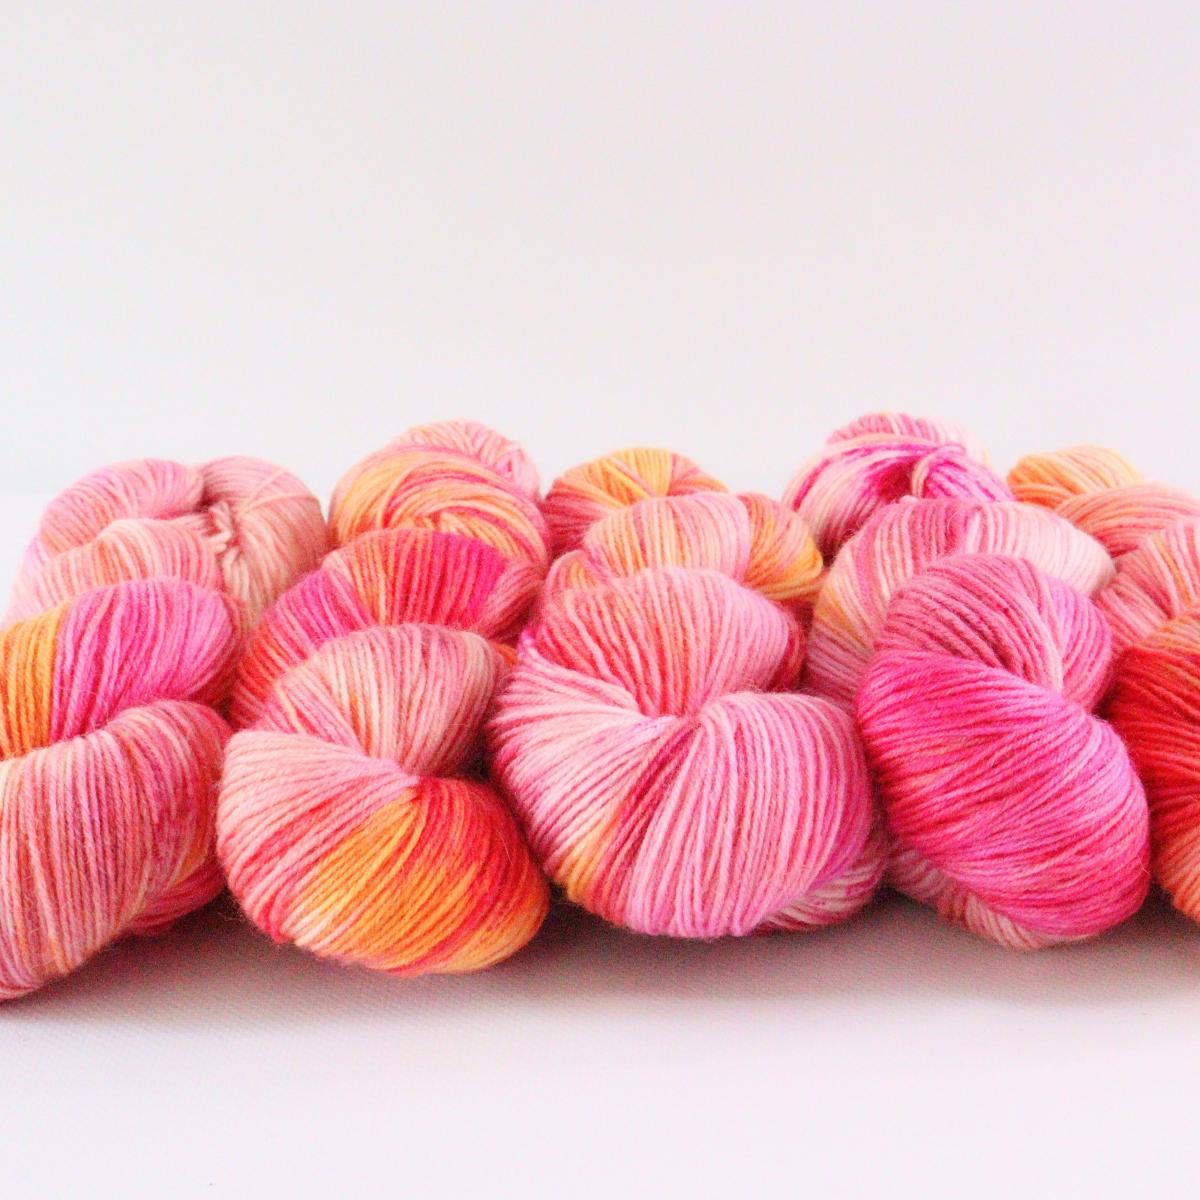 woodico.pro hand dyed yarn 076 4 1200x1200 - Hand dyed yarn / 076